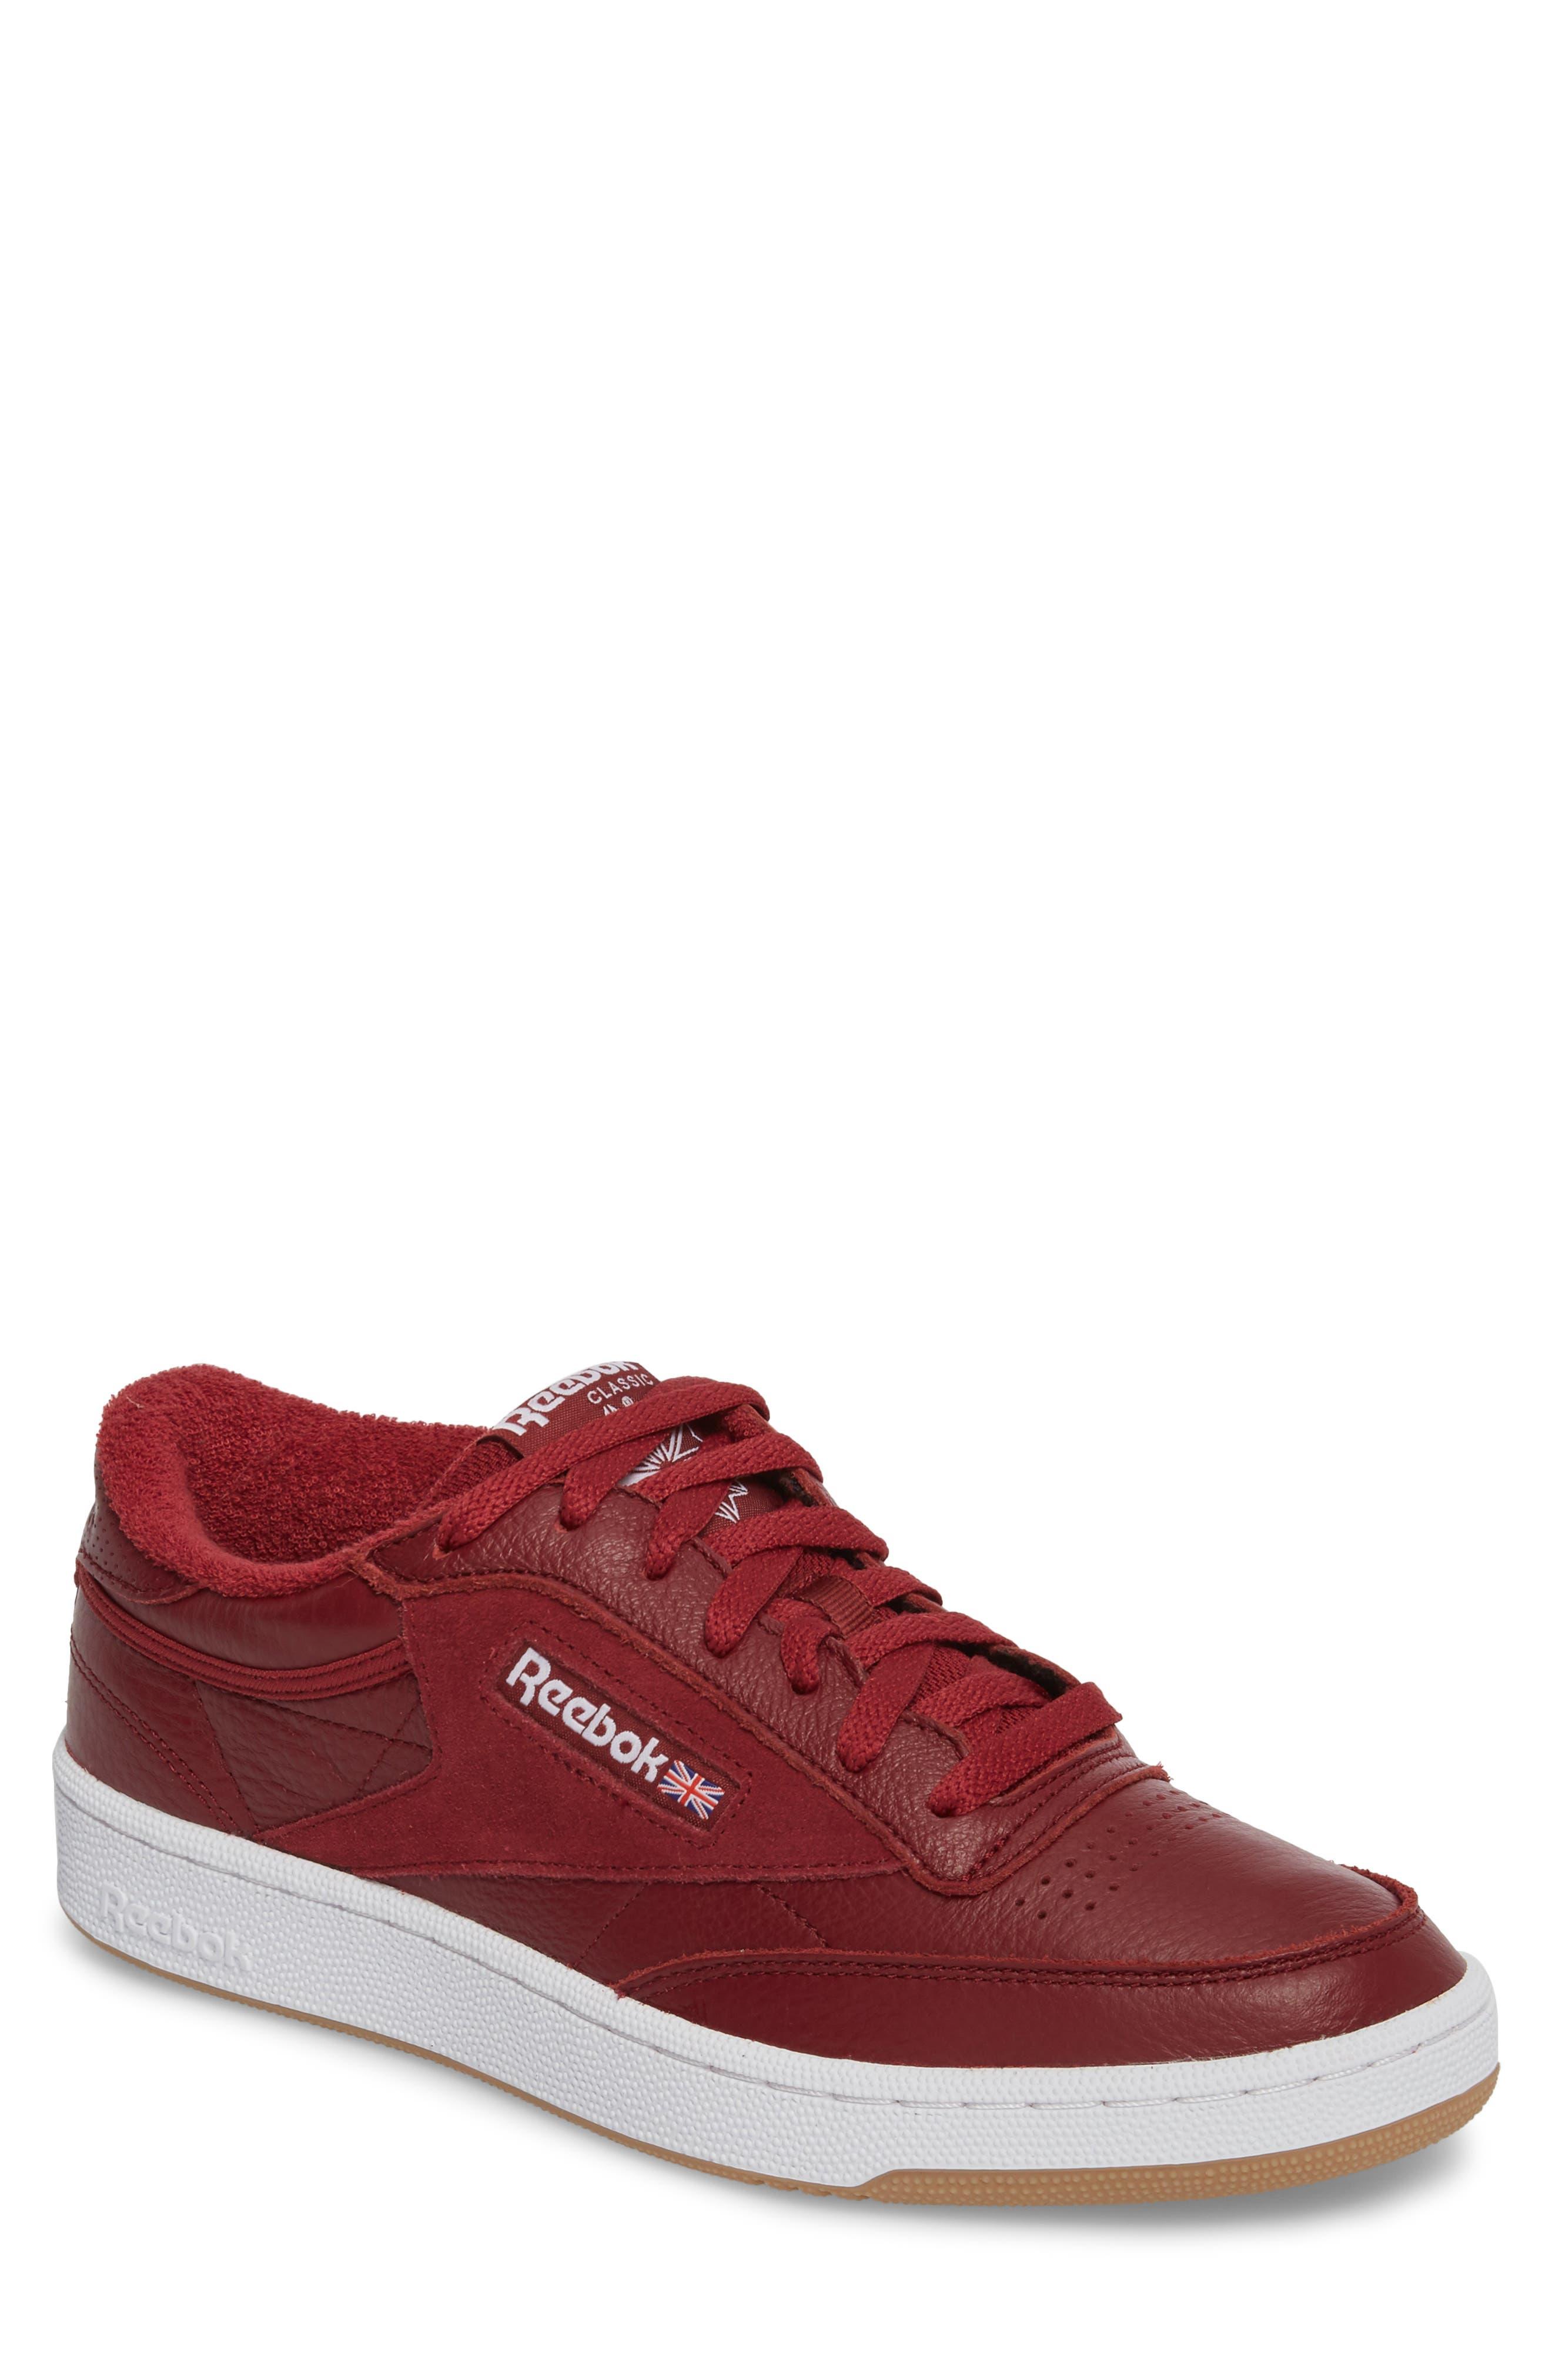 Reebok Club C 85 ESTL Sneaker (Men)